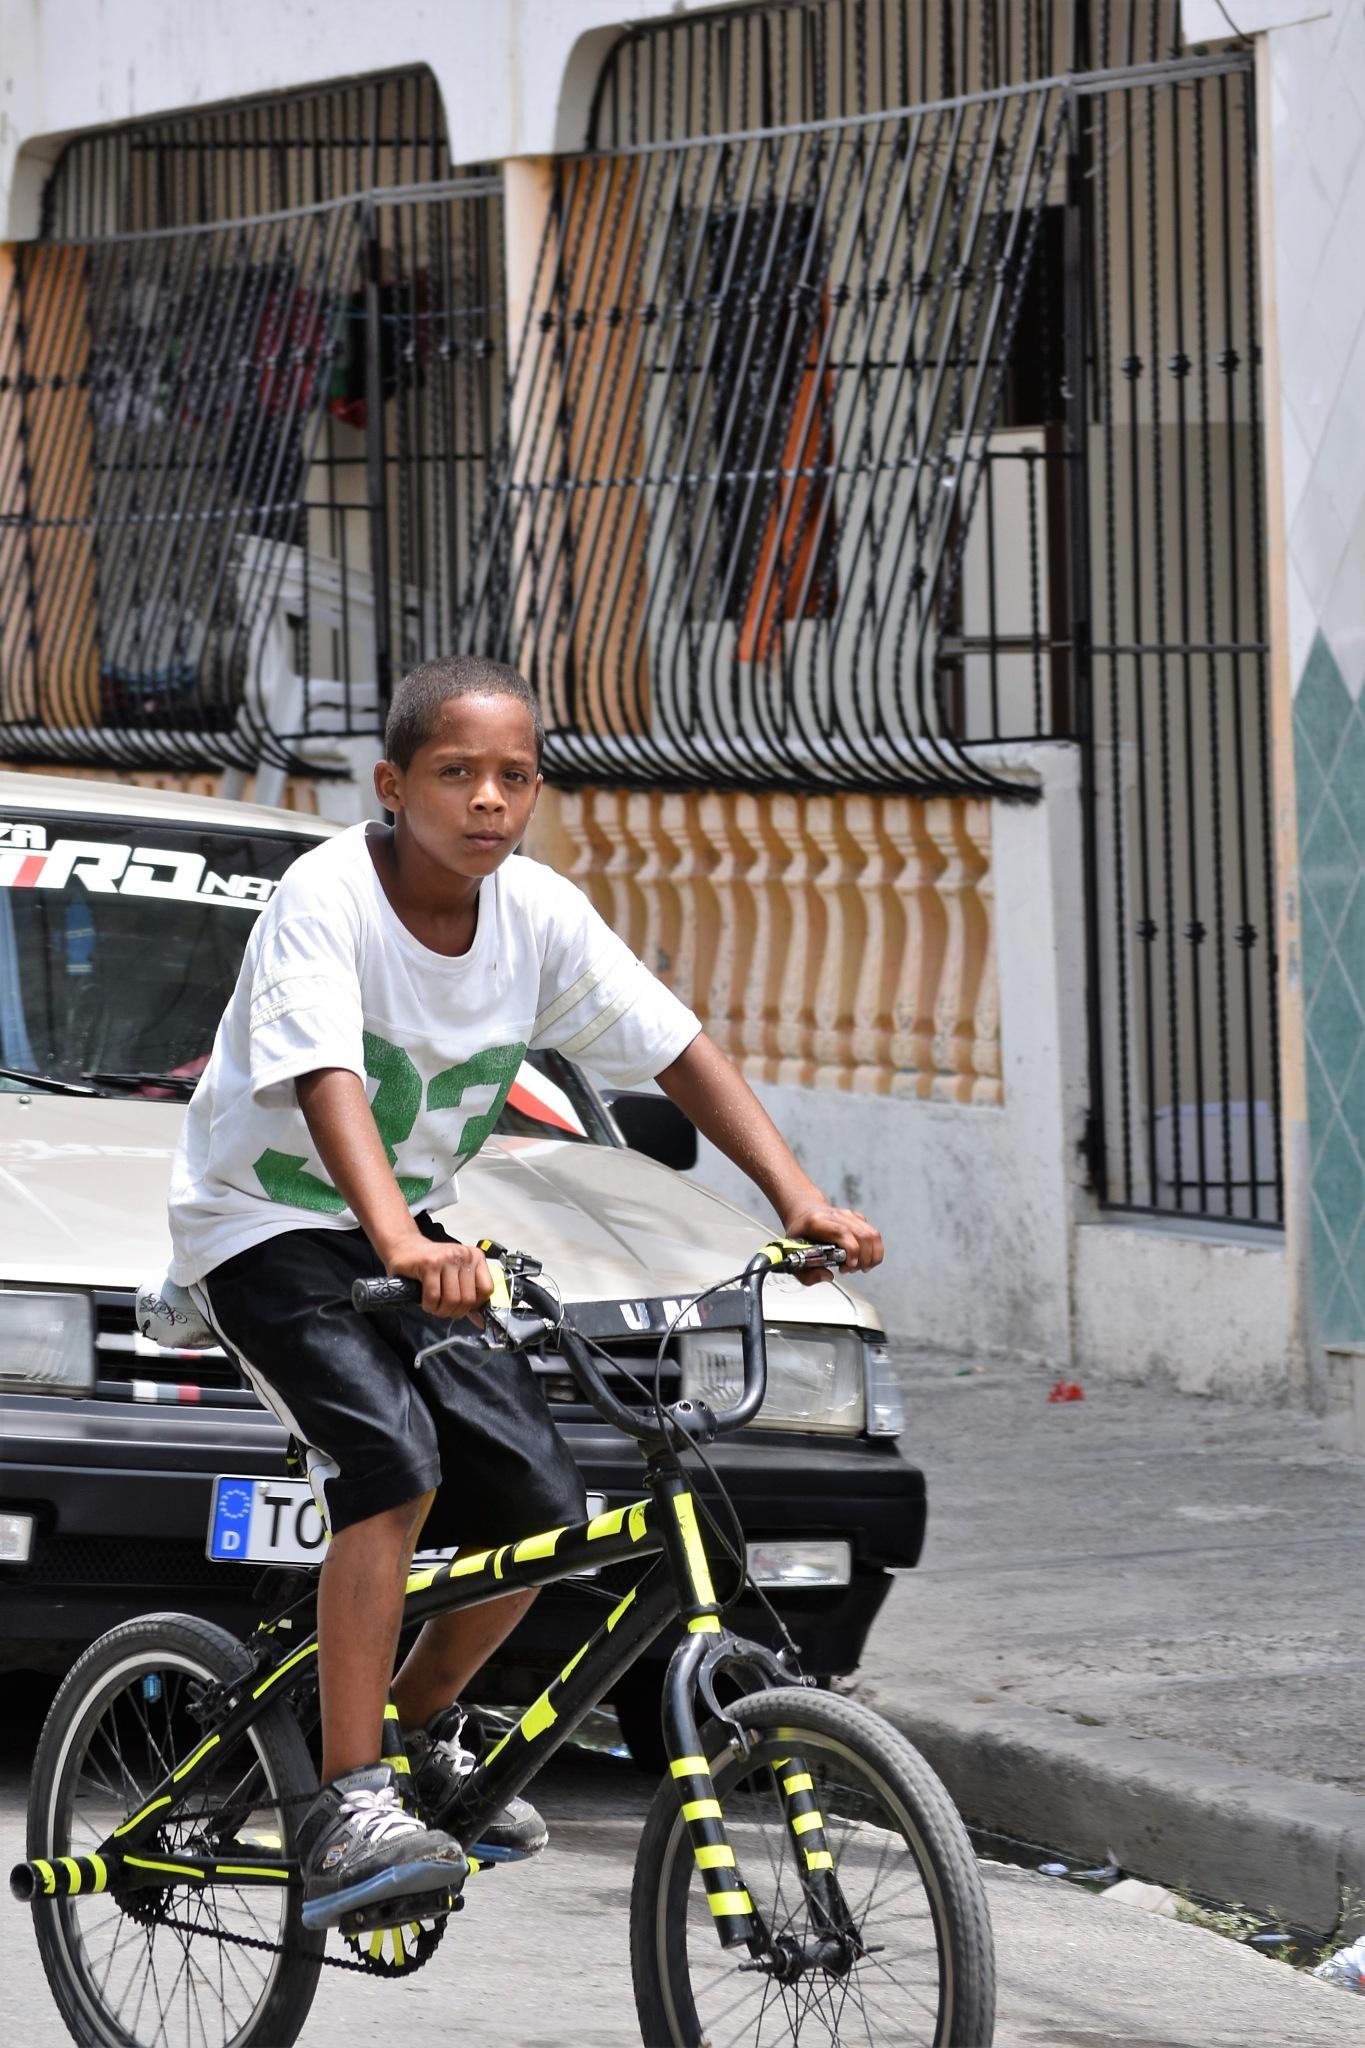 bike by robert butts